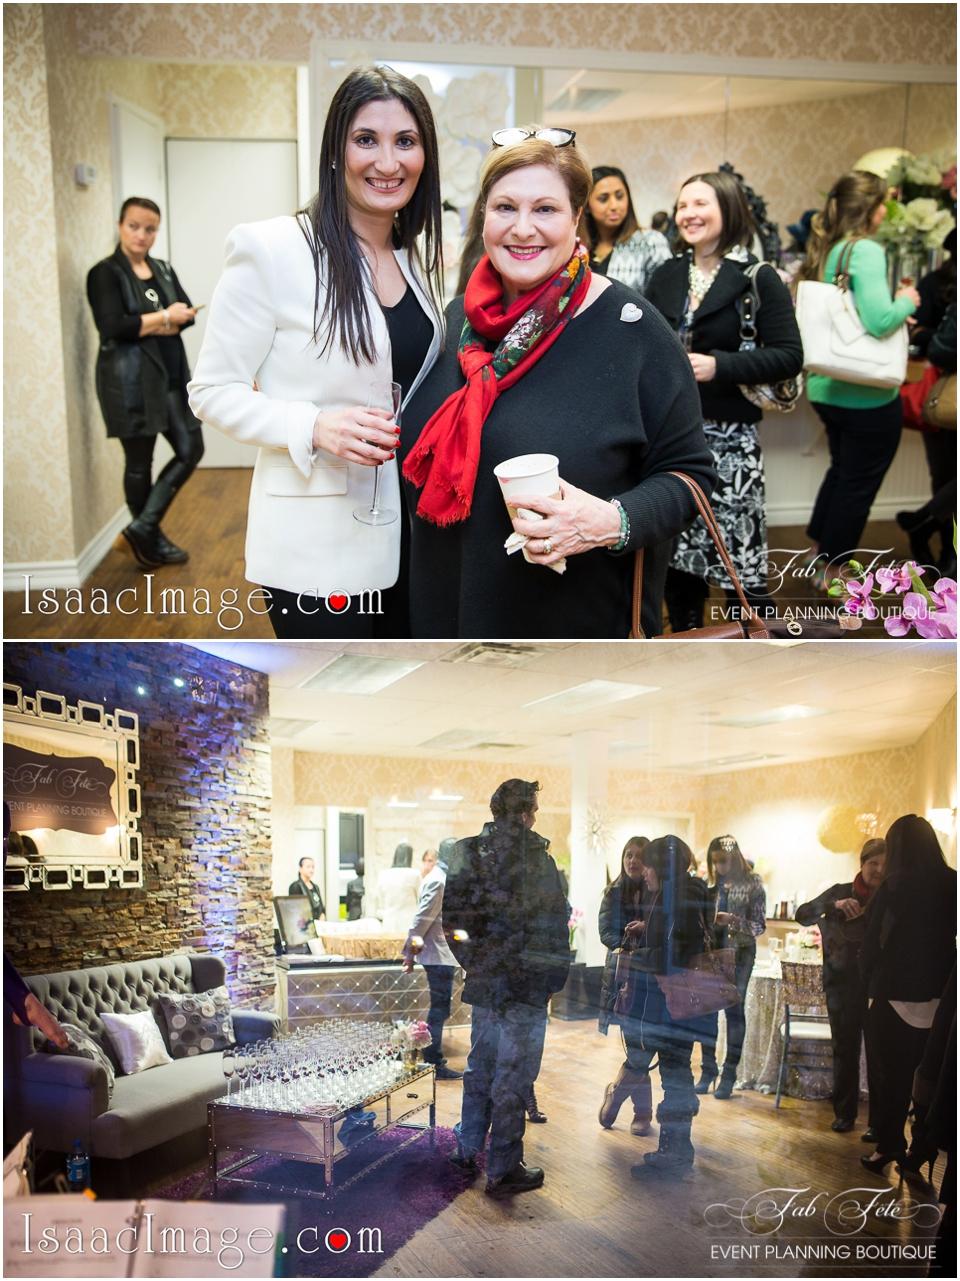 Fab Fete Toronto Wedding Event Planning Boutique open house_6474.jpg